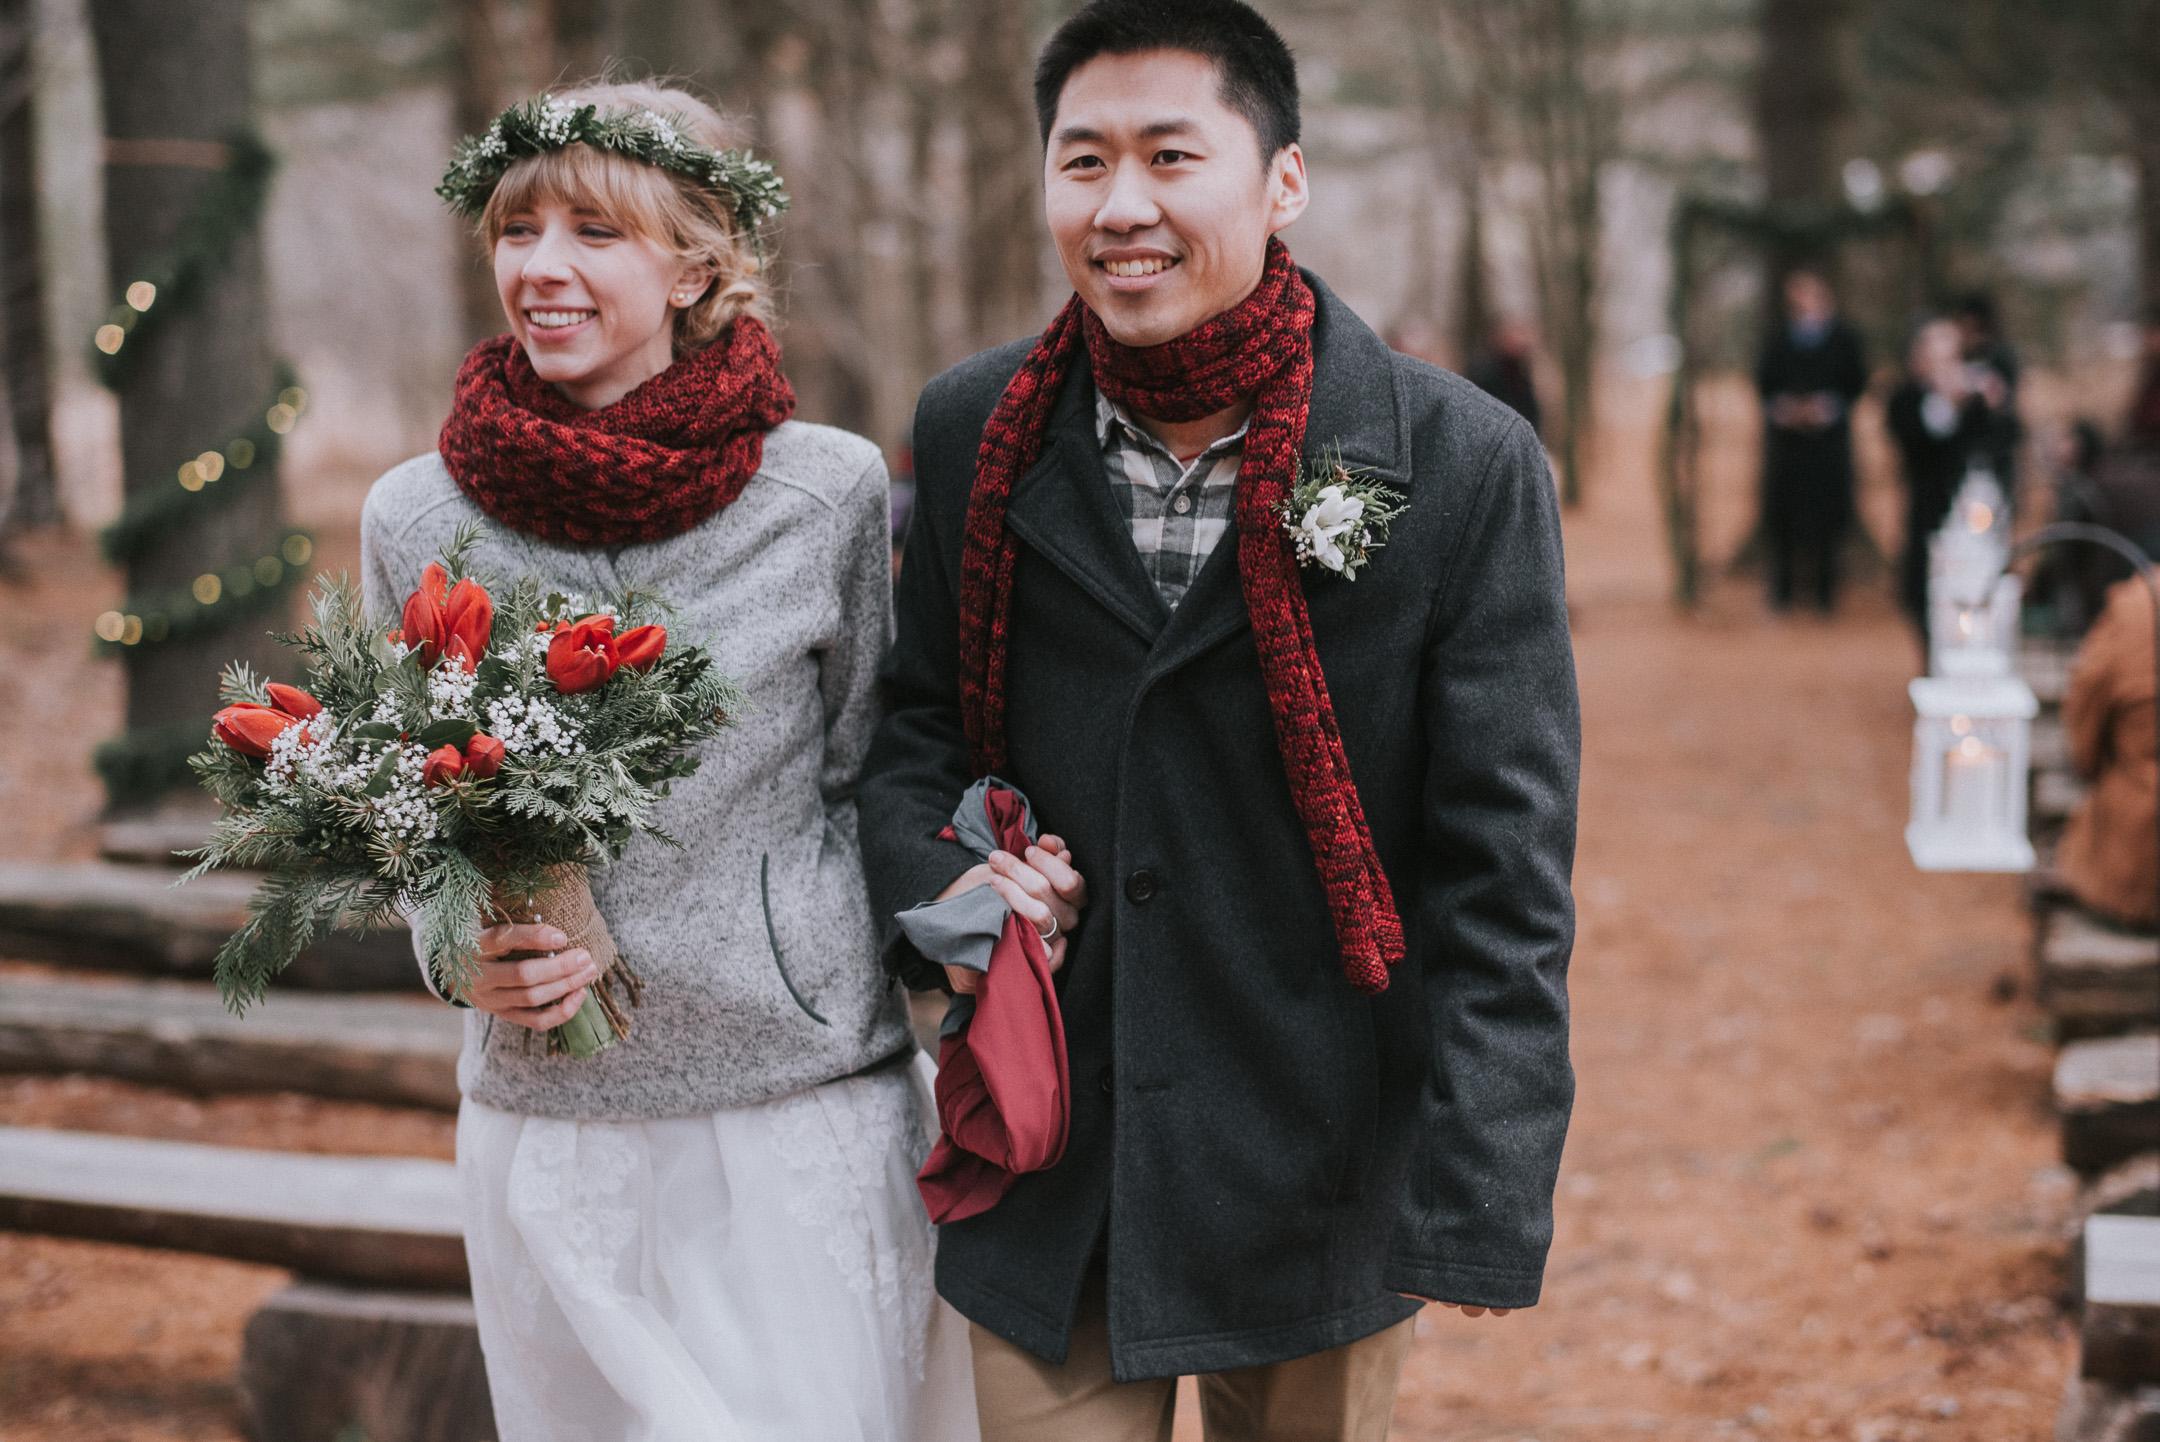 thurmont wedding photographer (37 of 38).jpg